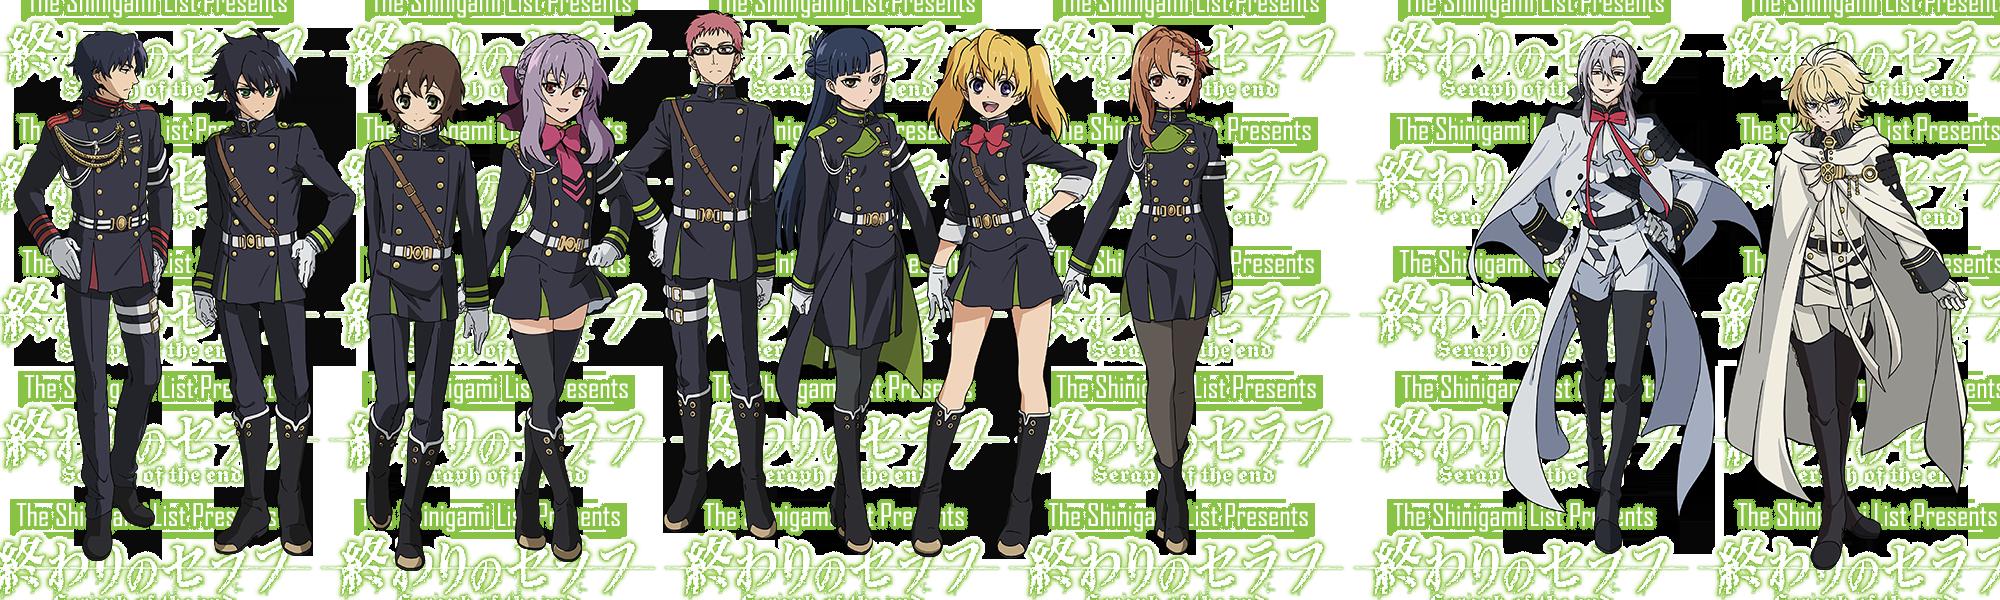 owari-no-seraph-characters.png